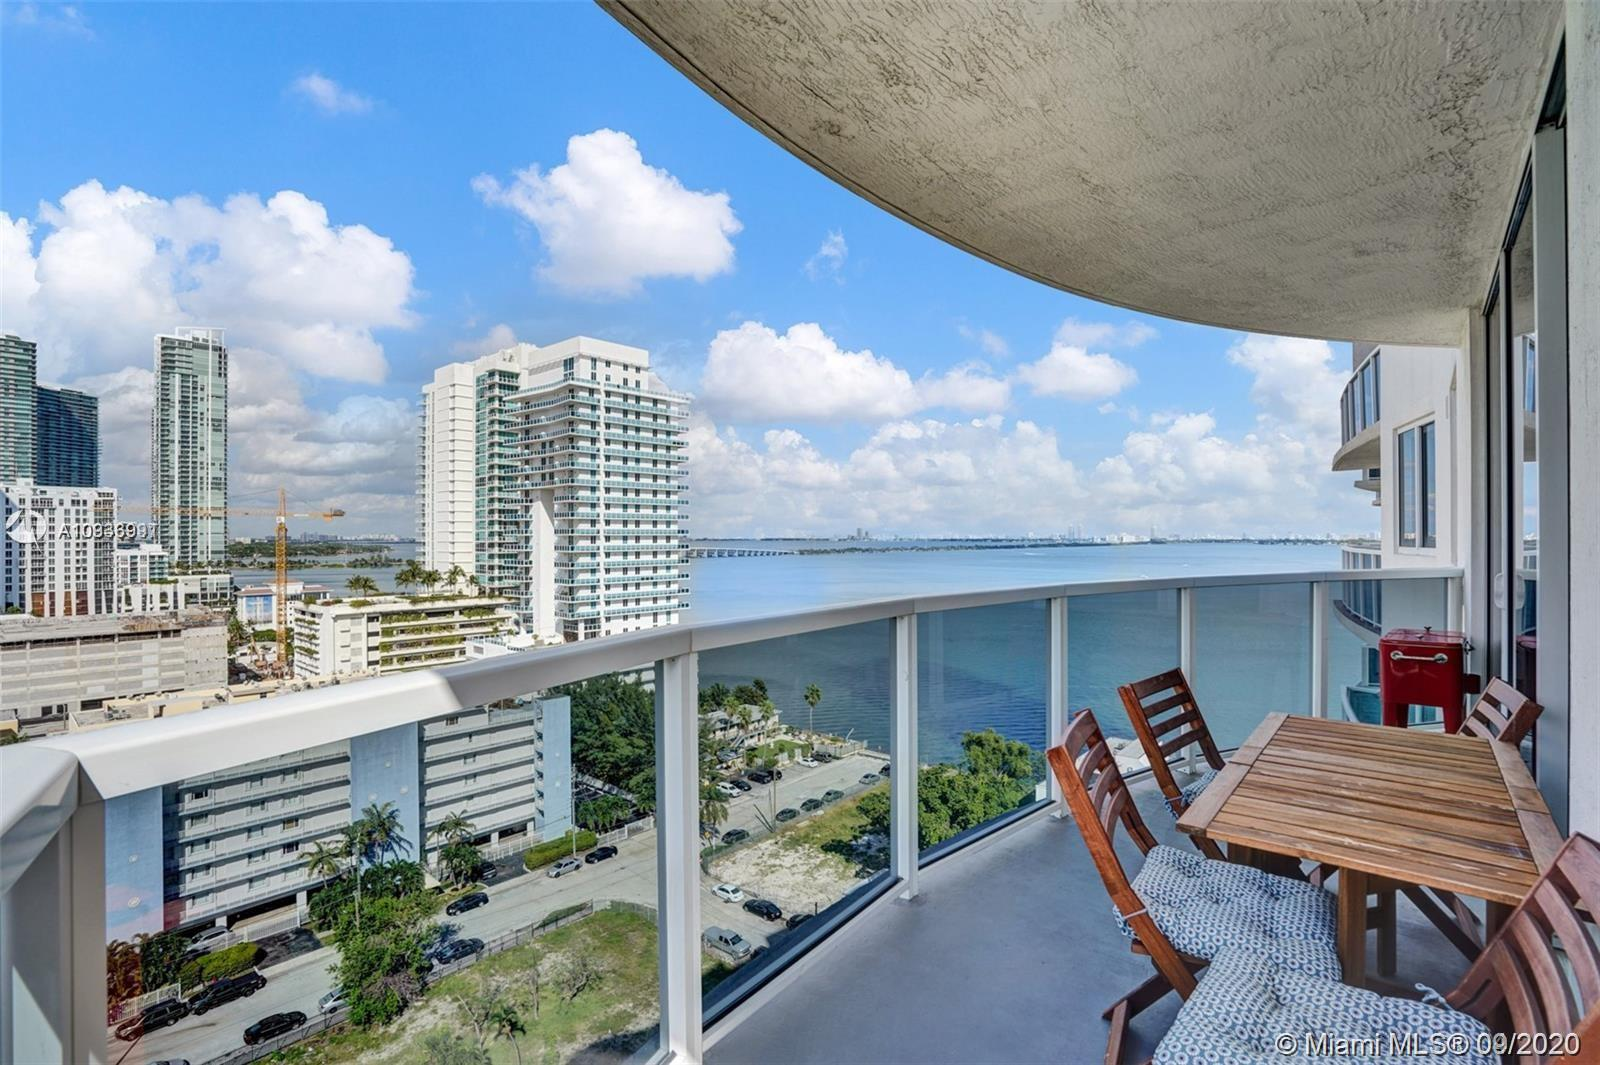 23 Biscayne Bay #1706 - 601 NE 23rd St #1706, Miami, FL 33137